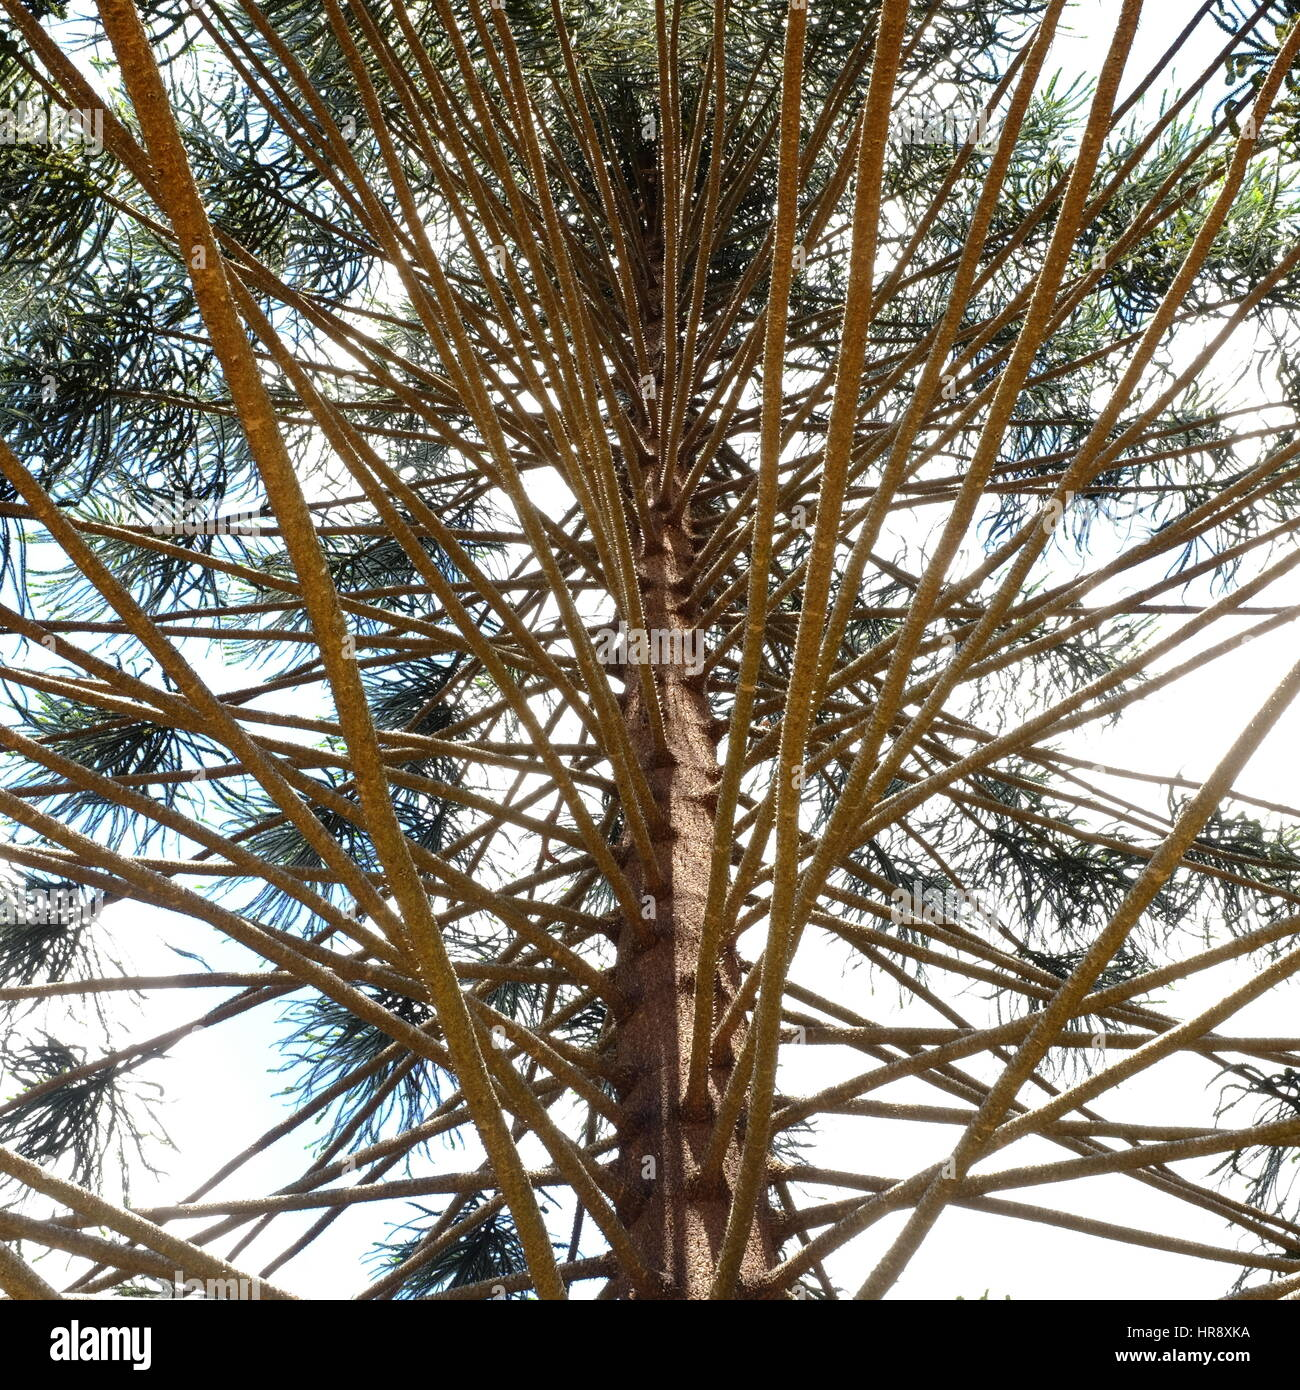 Bunya branches - Stock Image